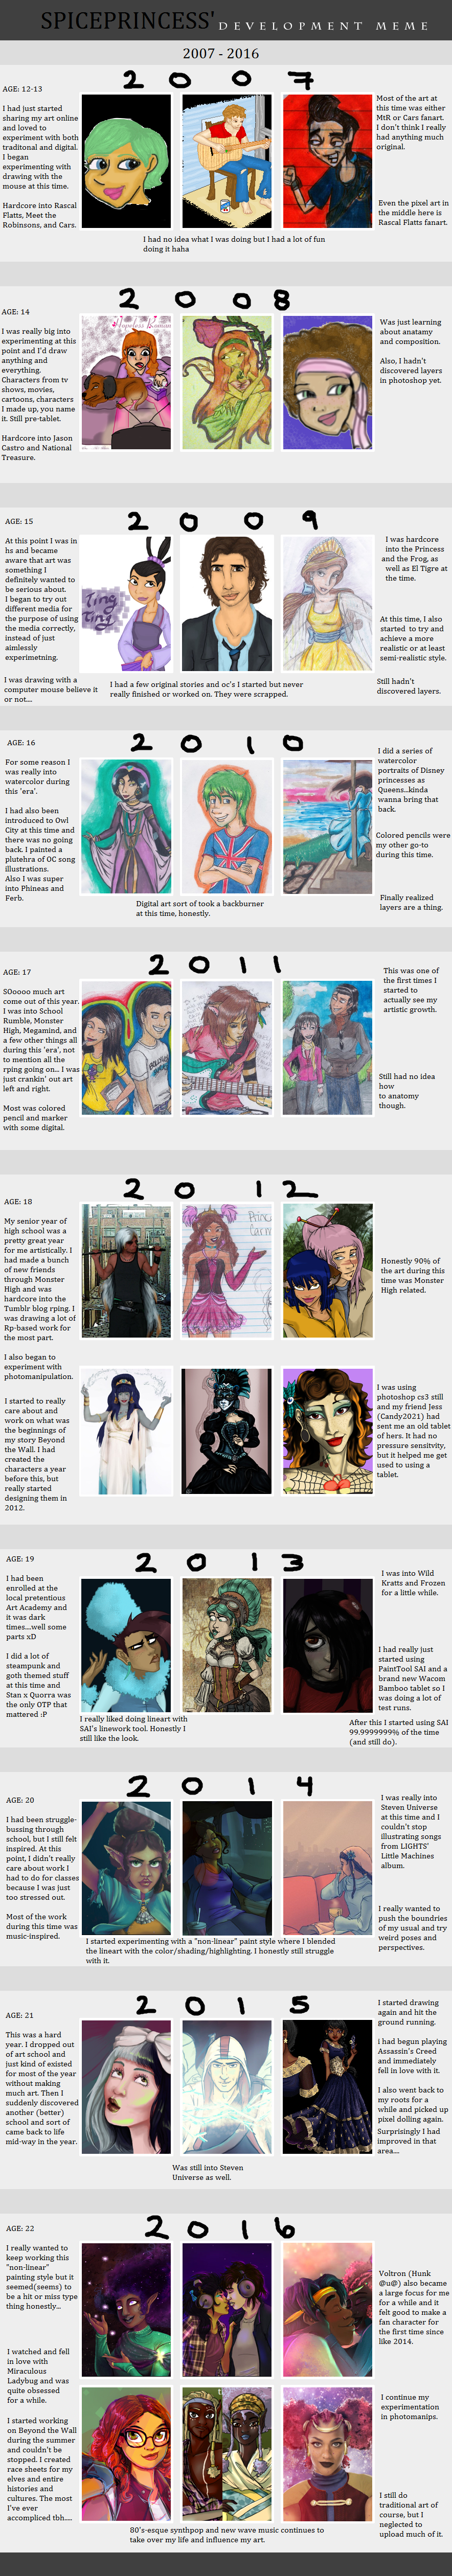 Development Meme 2007 - 2016 by SpicePrincess